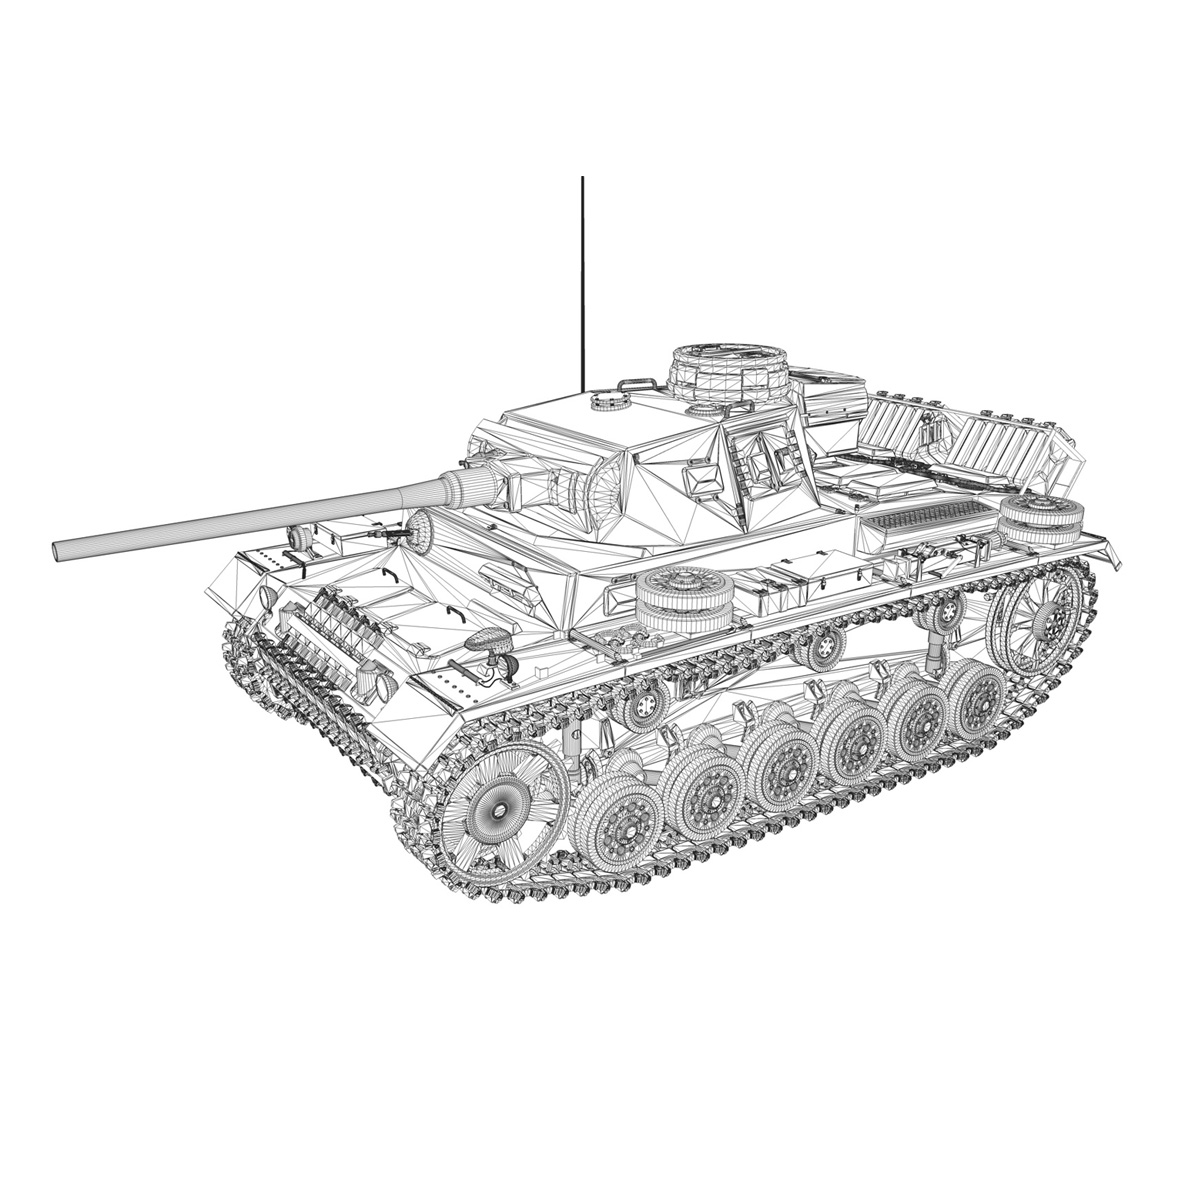 pzkpfw iii – panzer 3 – ausf.j – 523 3d model 3ds fbx c4d lwo obj 189083